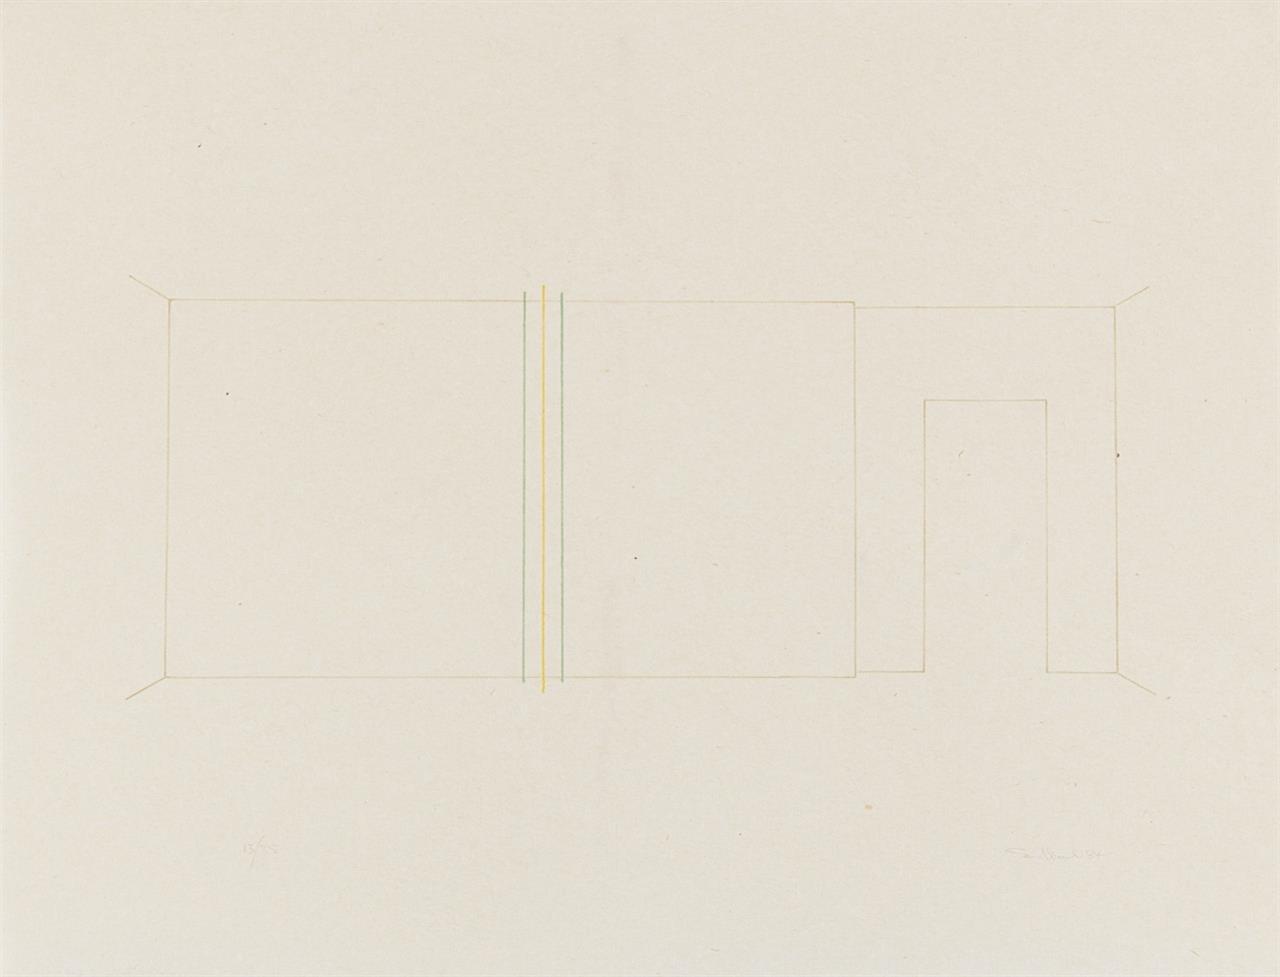 Fred Sandback. Ohne Titel. 1984. Farblithographie auf Japan. Ex. 13/35.